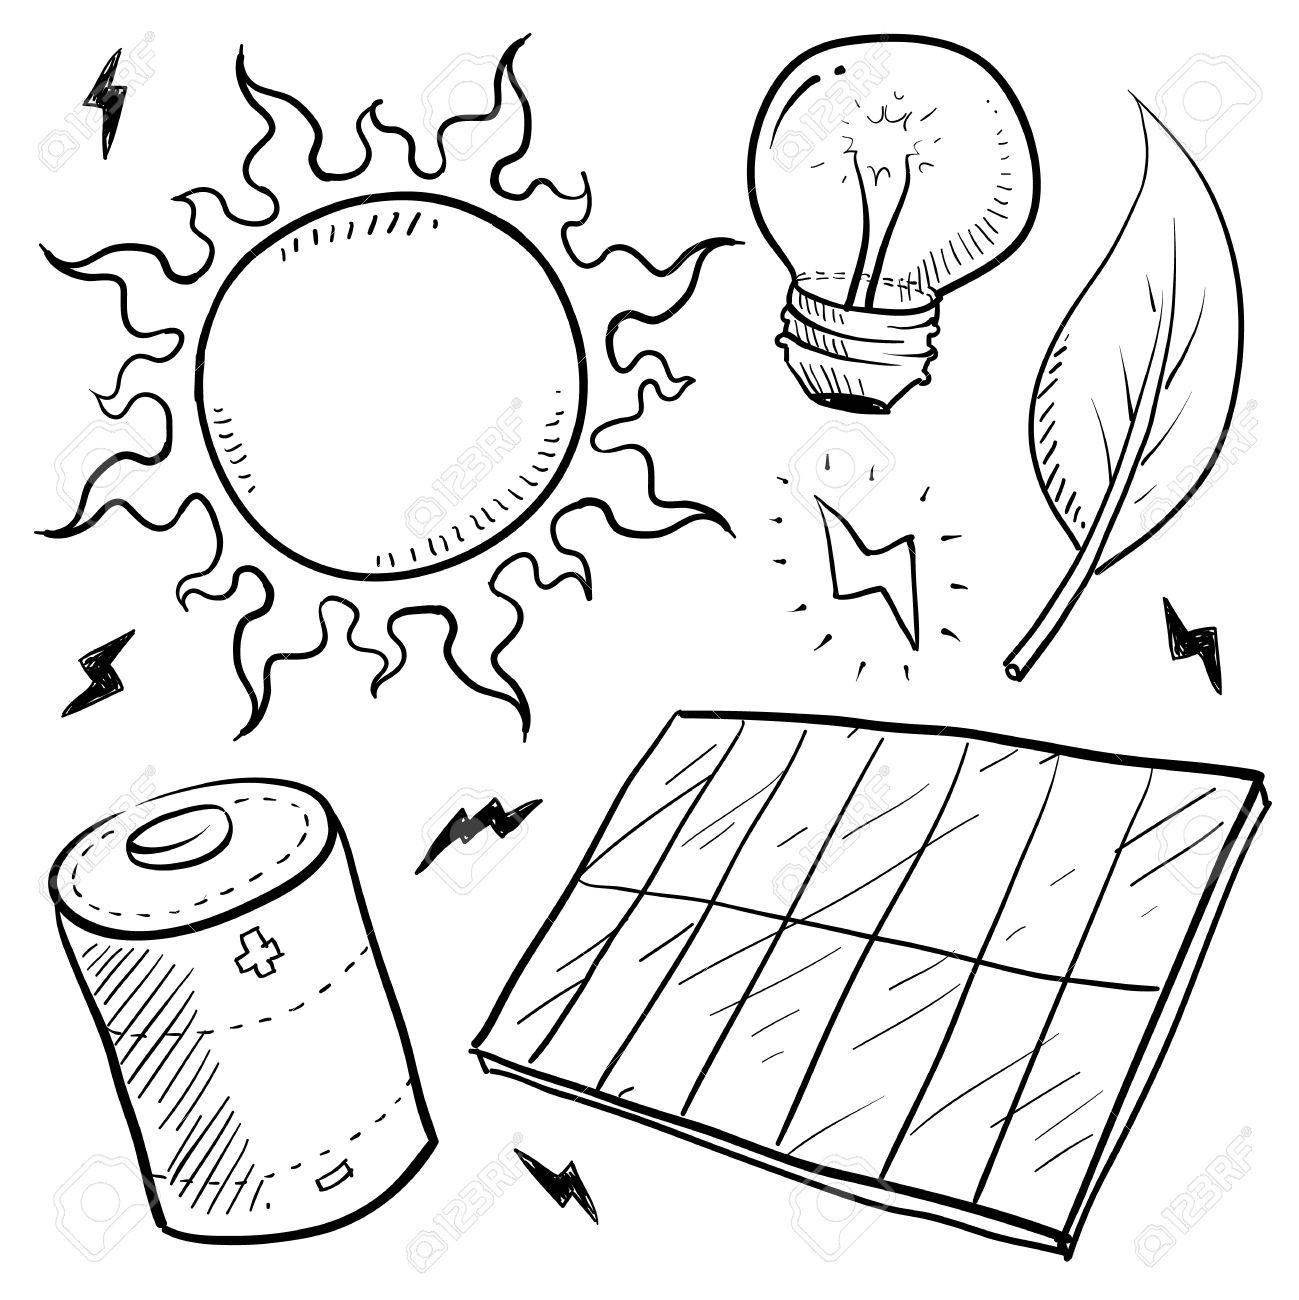 1299x1300 Drawing Of Solar Energy Doodle Style Renewable Solar Energy